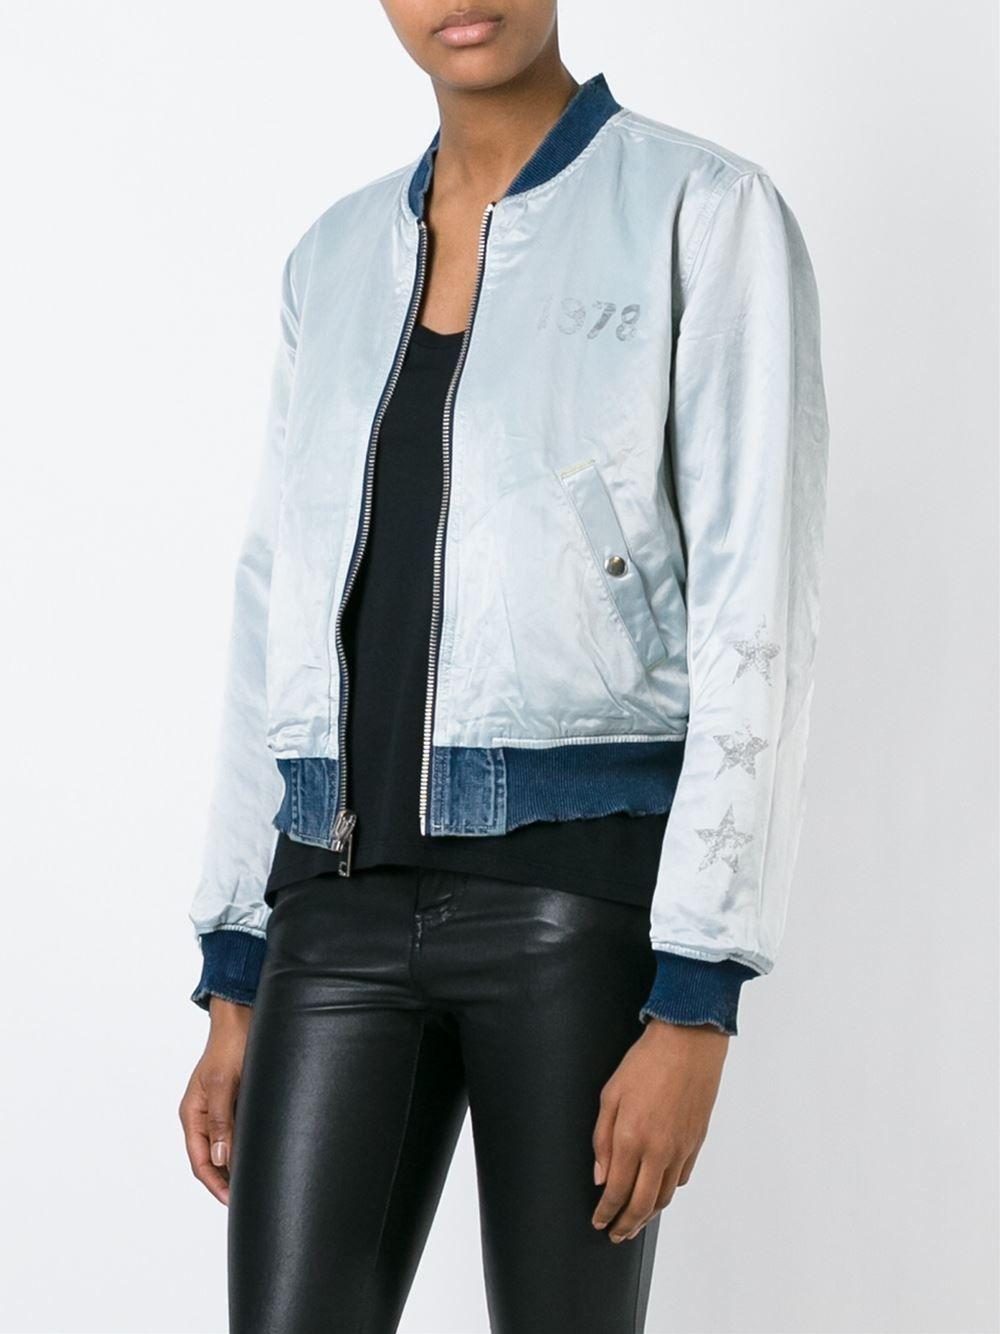 Diesel Reversible Bomber Jacket Likus Concept Store Farfetch Com Bomber Jacket Jackets Jackets For Women [ 1334 x 1000 Pixel ]